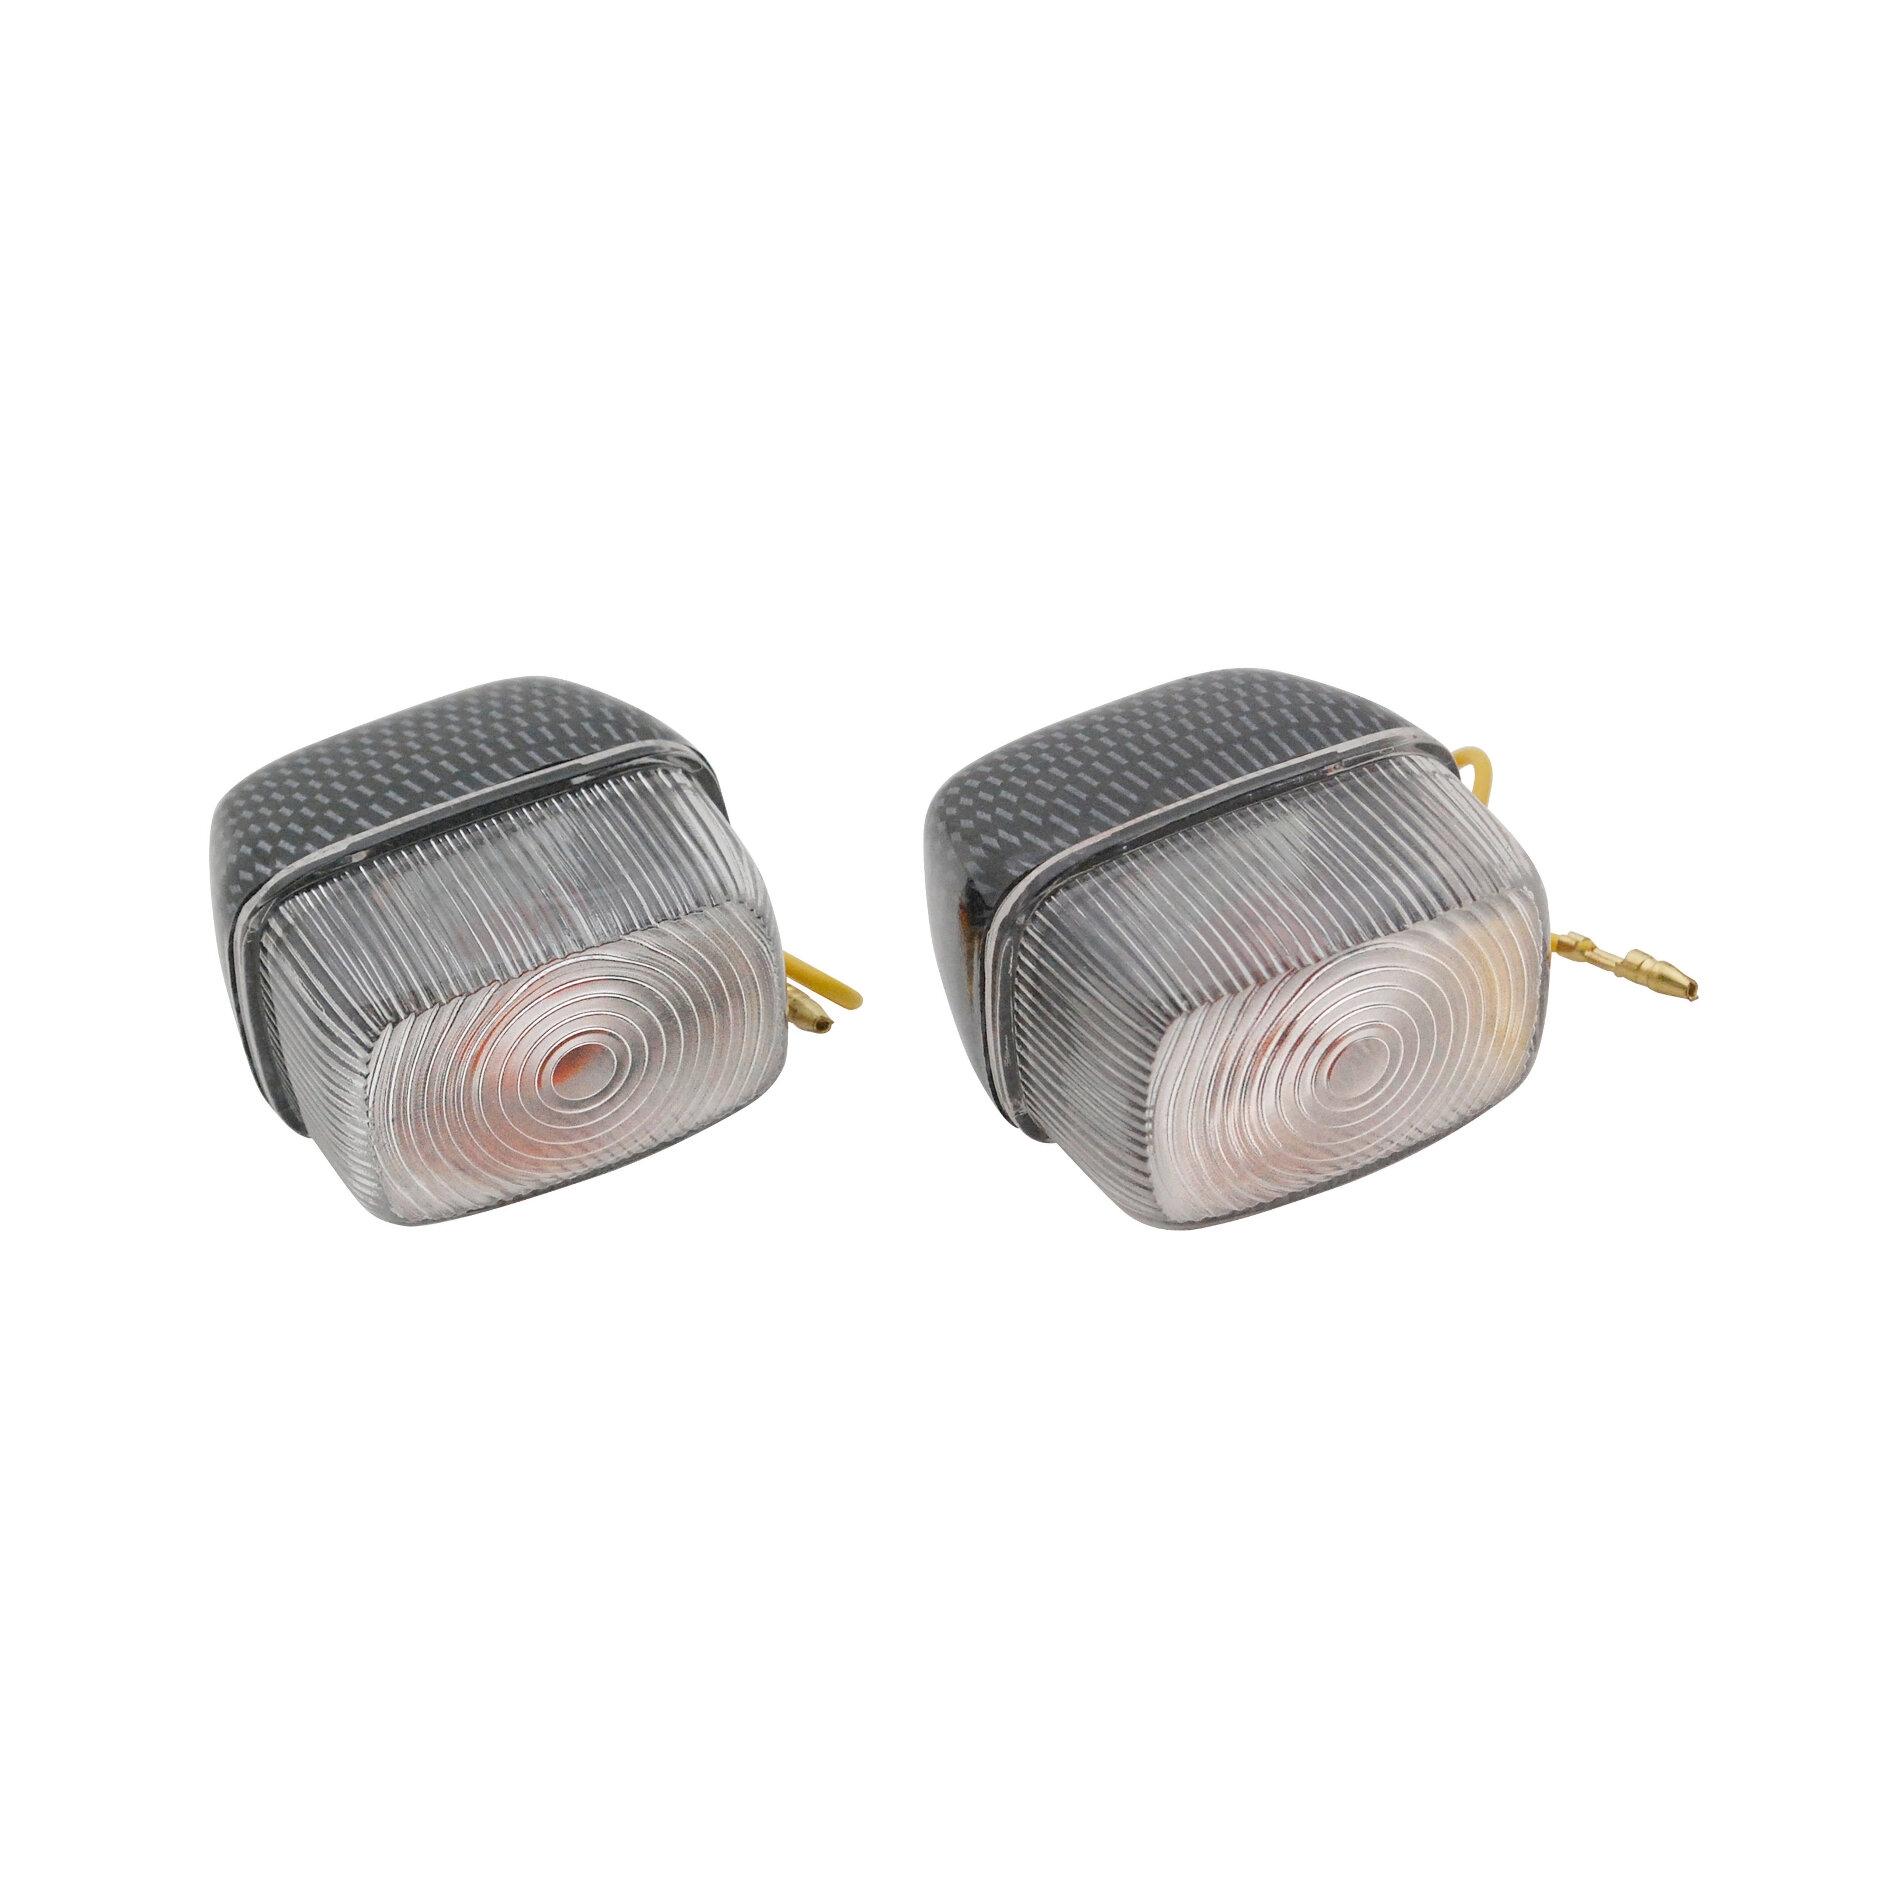 Clignotants avant transparent/carbone MBK 50 Booster/BW's 90/2003